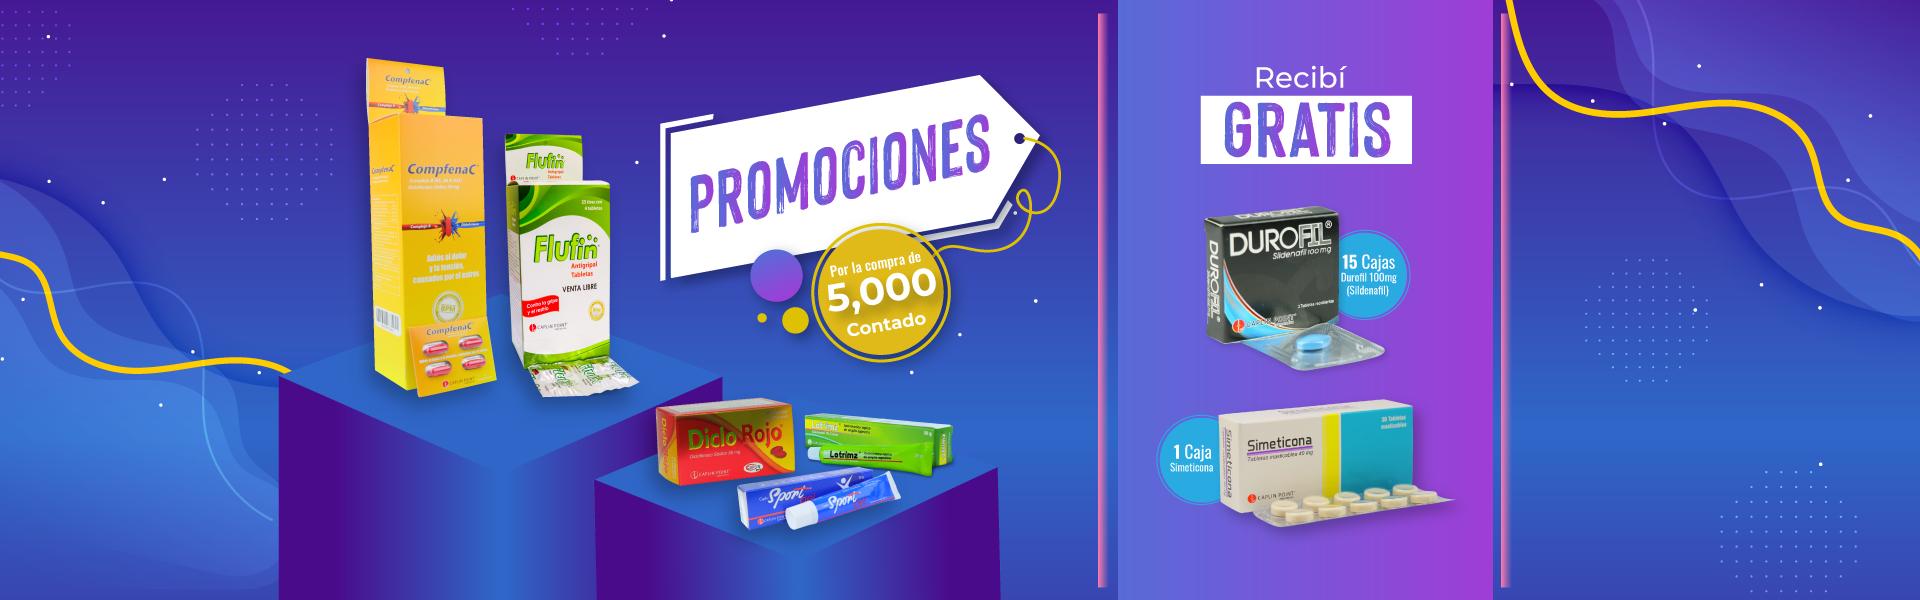 PromoContado5